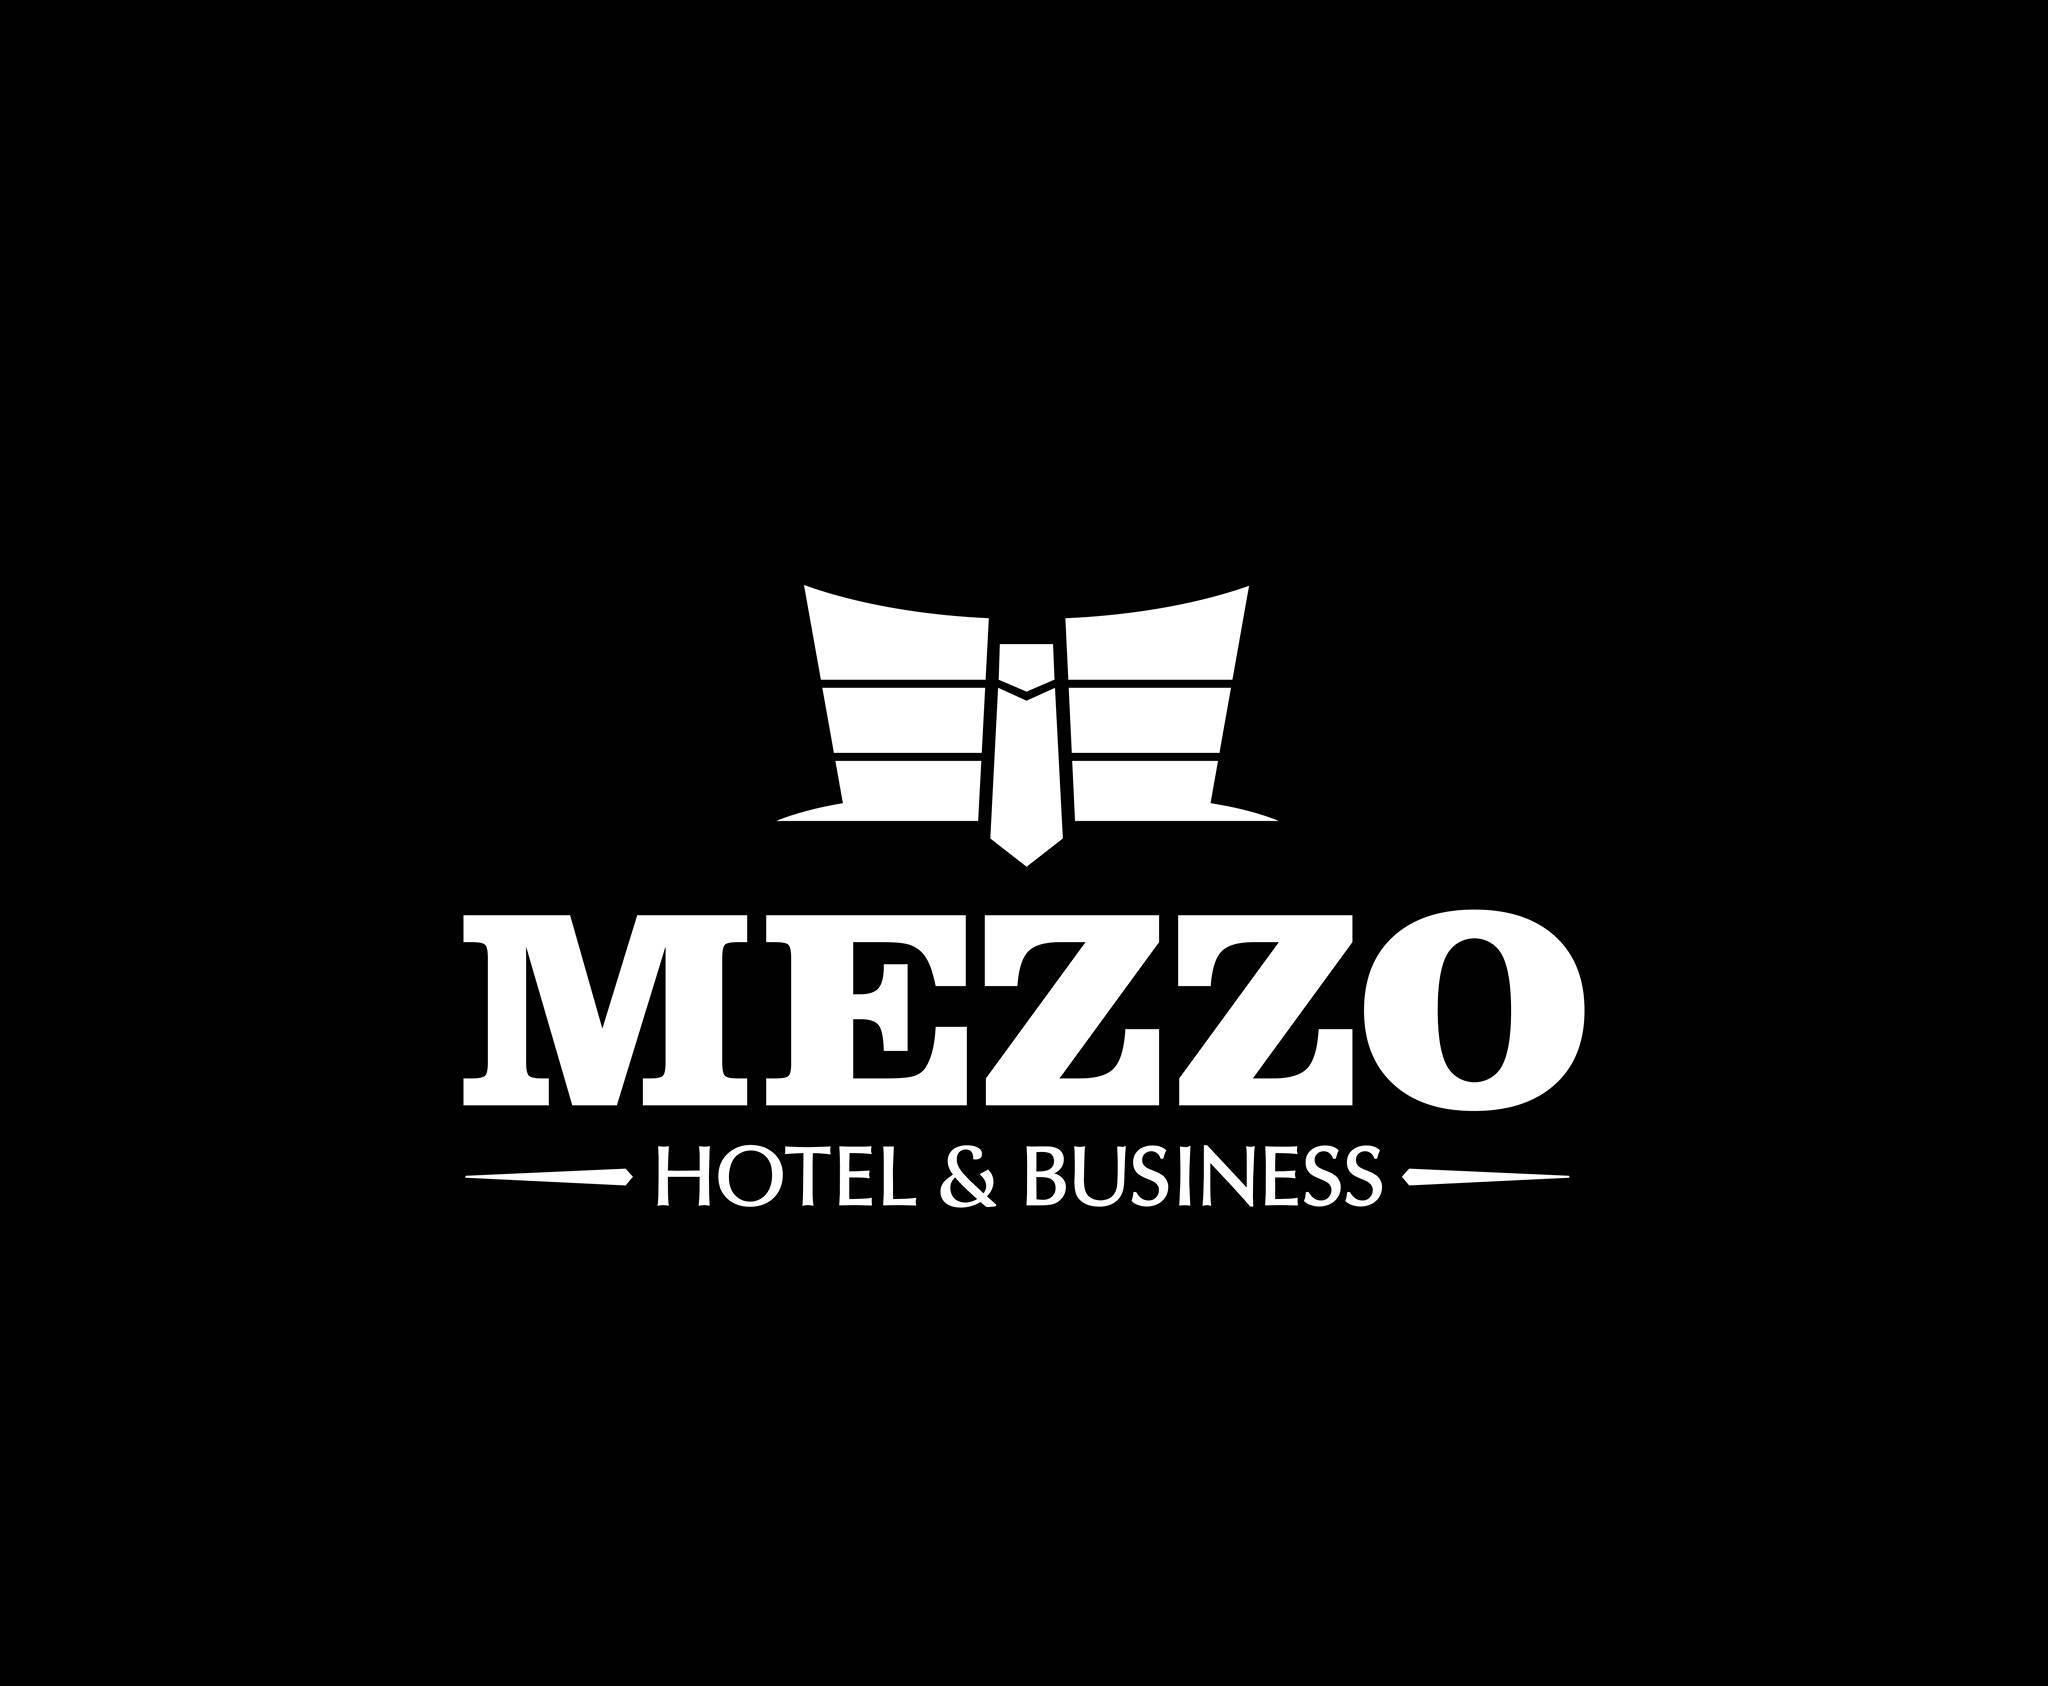 Mezzo hotel&business